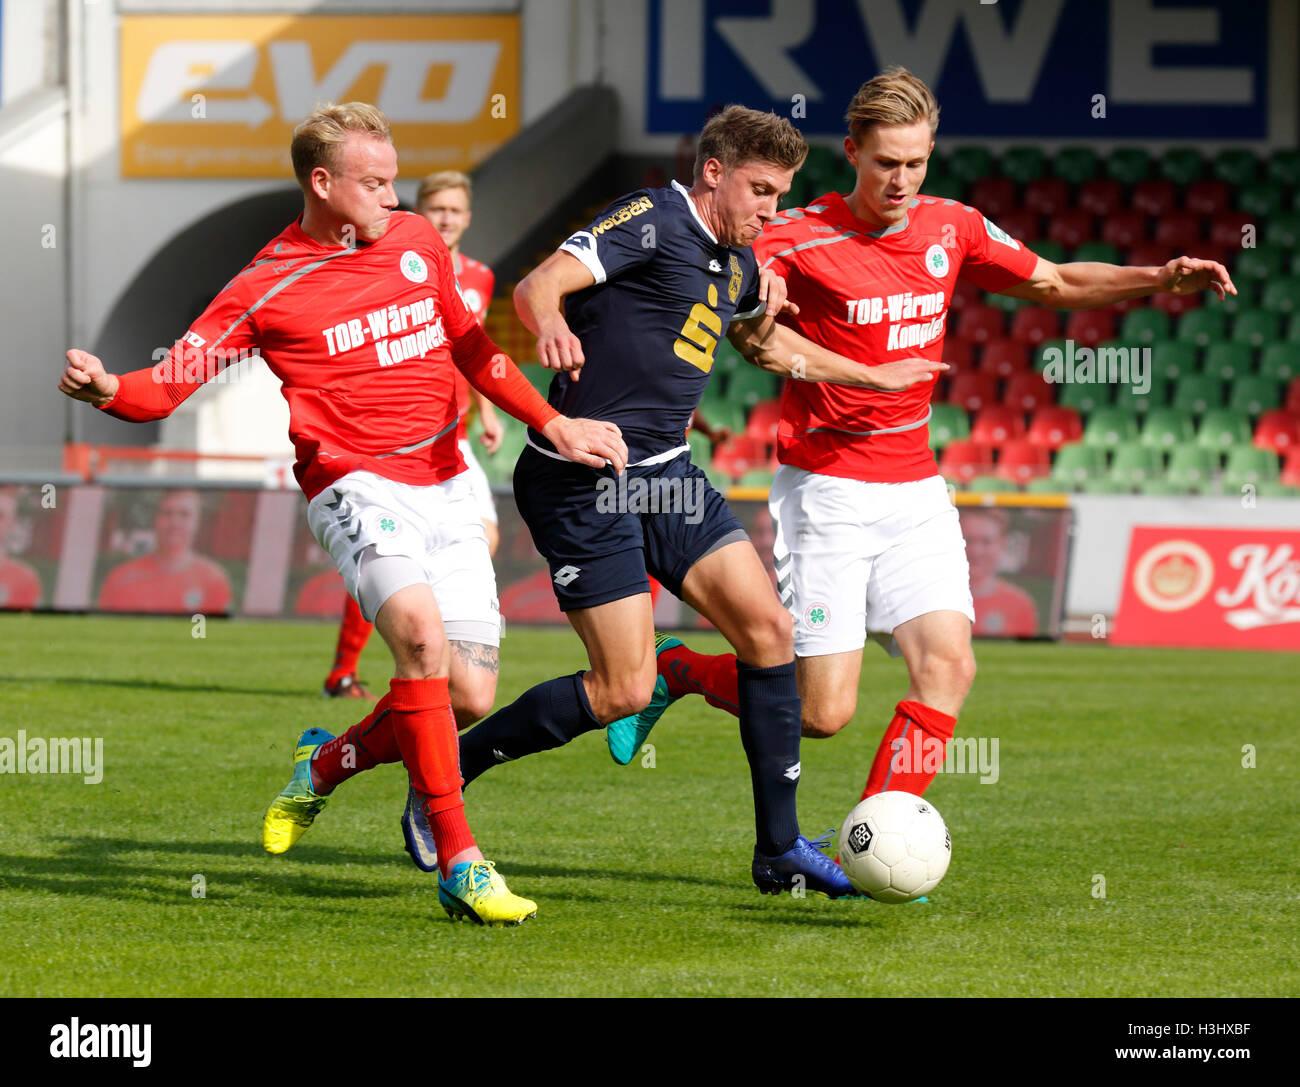 sports, football, Regional League West, 2016/2017, Rot Weiss Oberhausen versus Bonner SC 5:1, Stadium Niederrhein - Stock Image